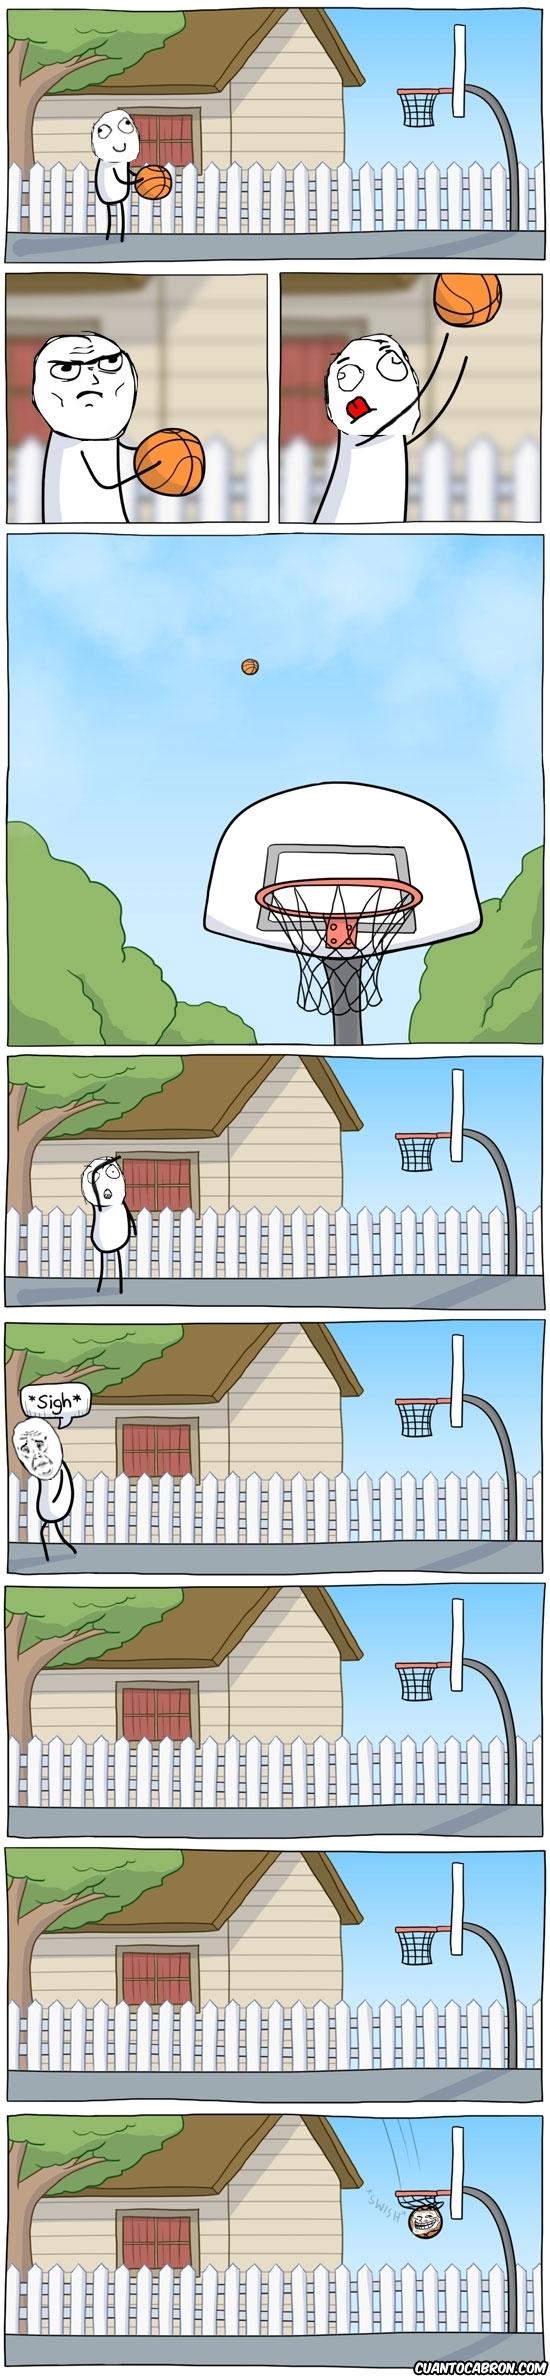 baloncesto,basket,canasta,fuerza sobrehumana,pelota,trollface